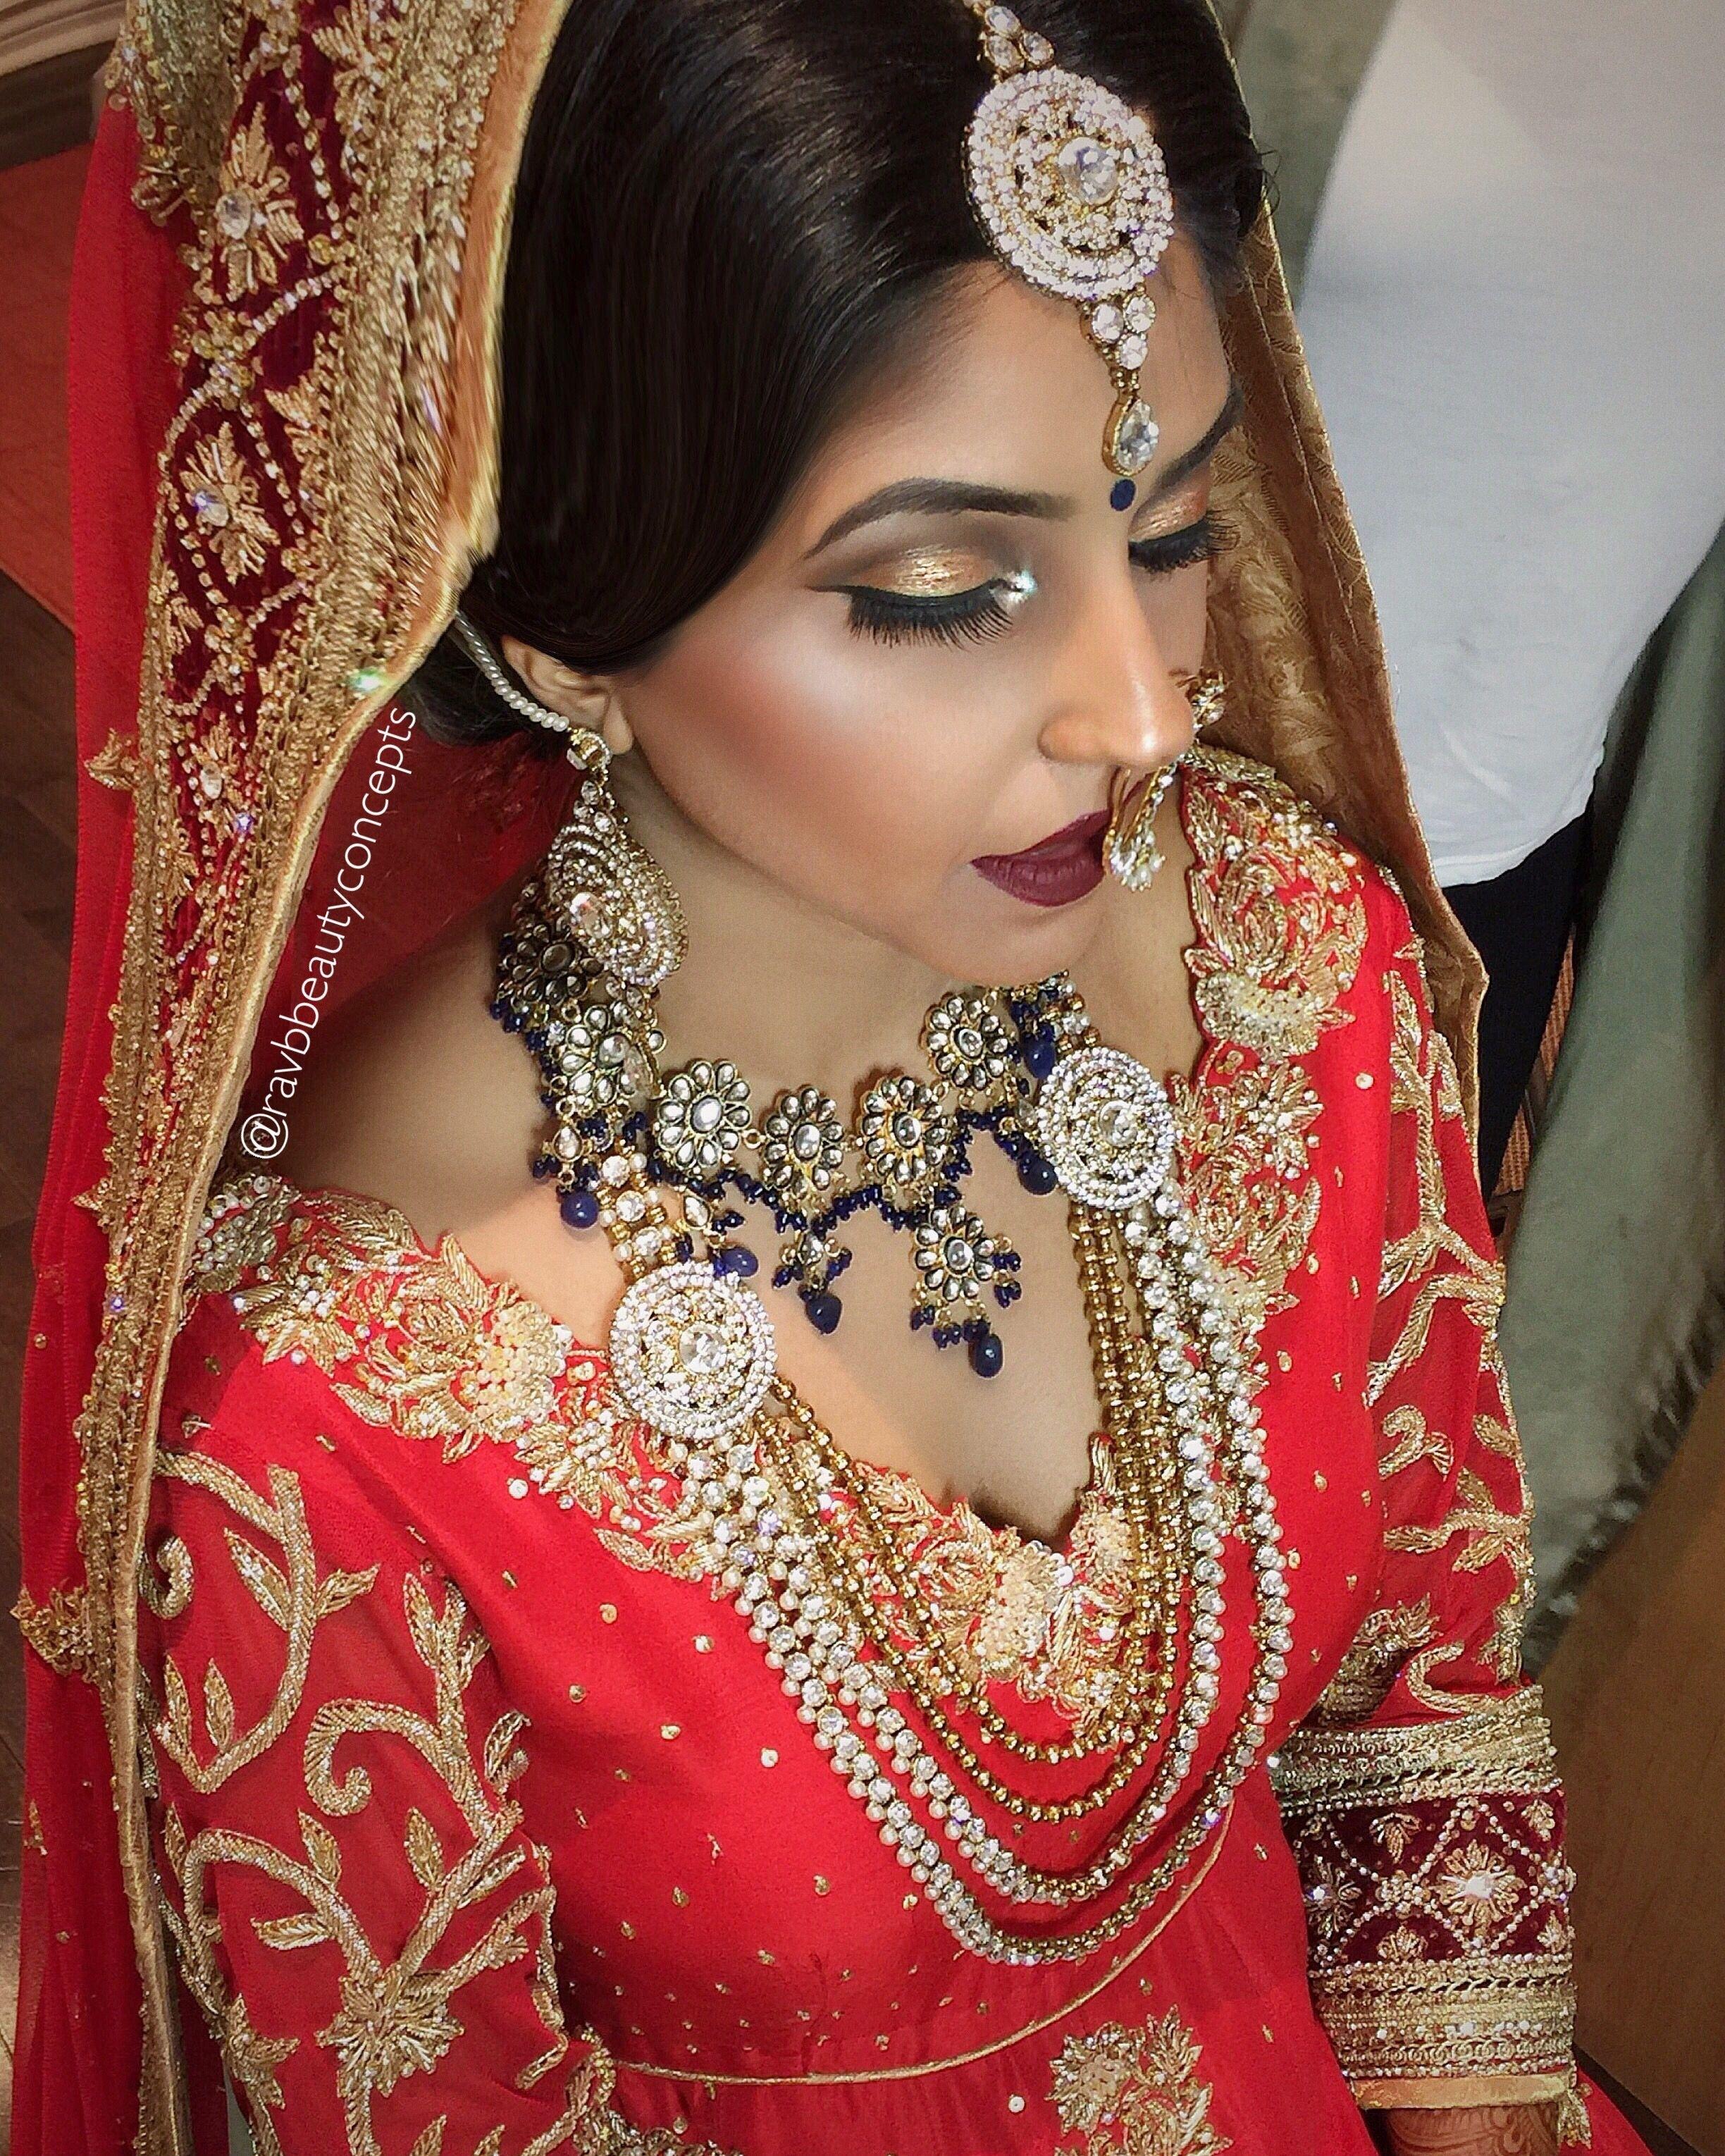 Indian Bridal Makeup, Indian Bridal Hair, Bridal Makeup, Bridal Hair pertaining to Punjabi Bridal Makeup Images